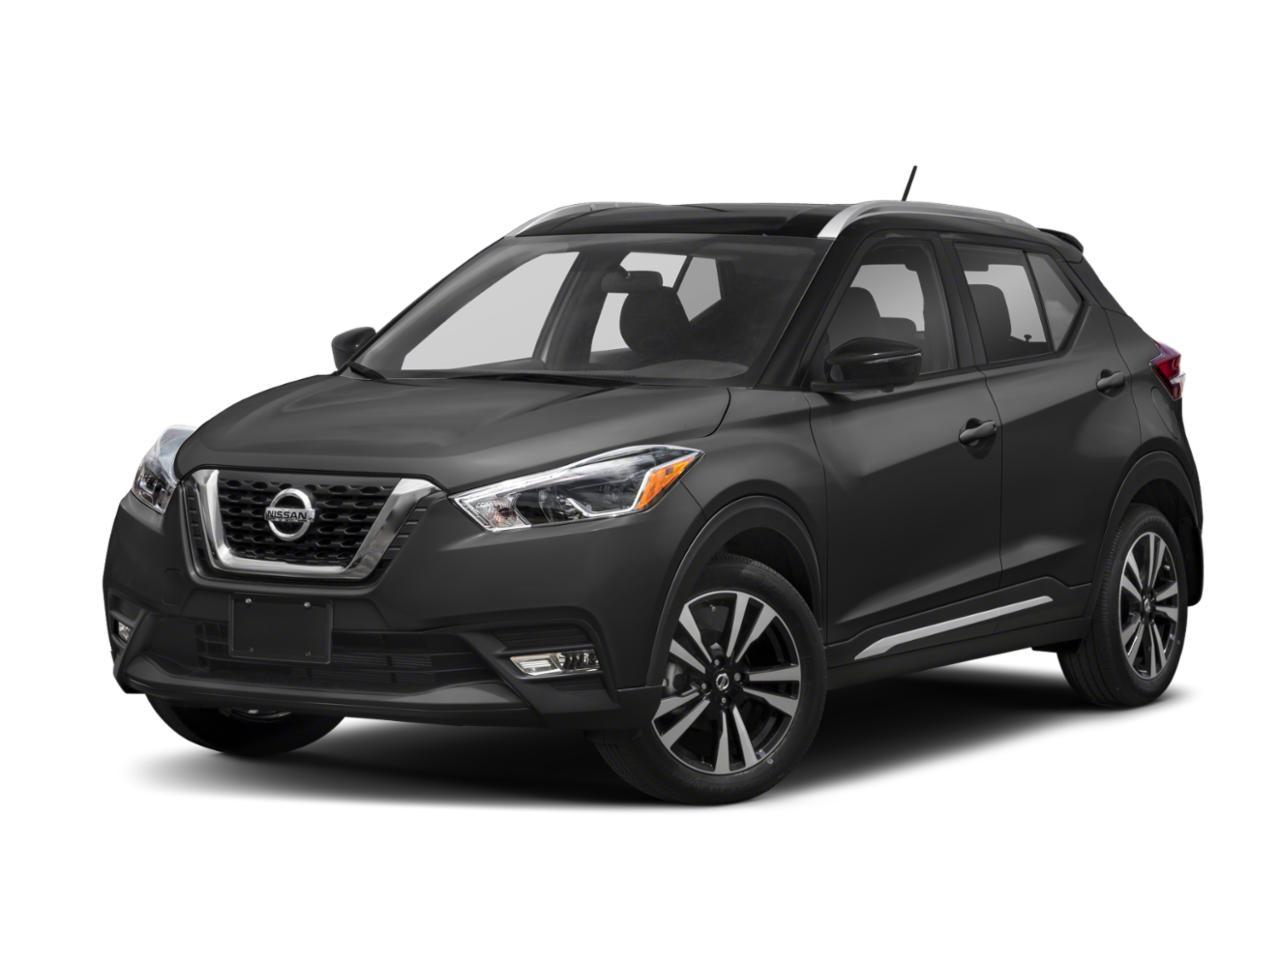 2020 Nissan Kicks Vehicle Photo in Appleton, WI 54913